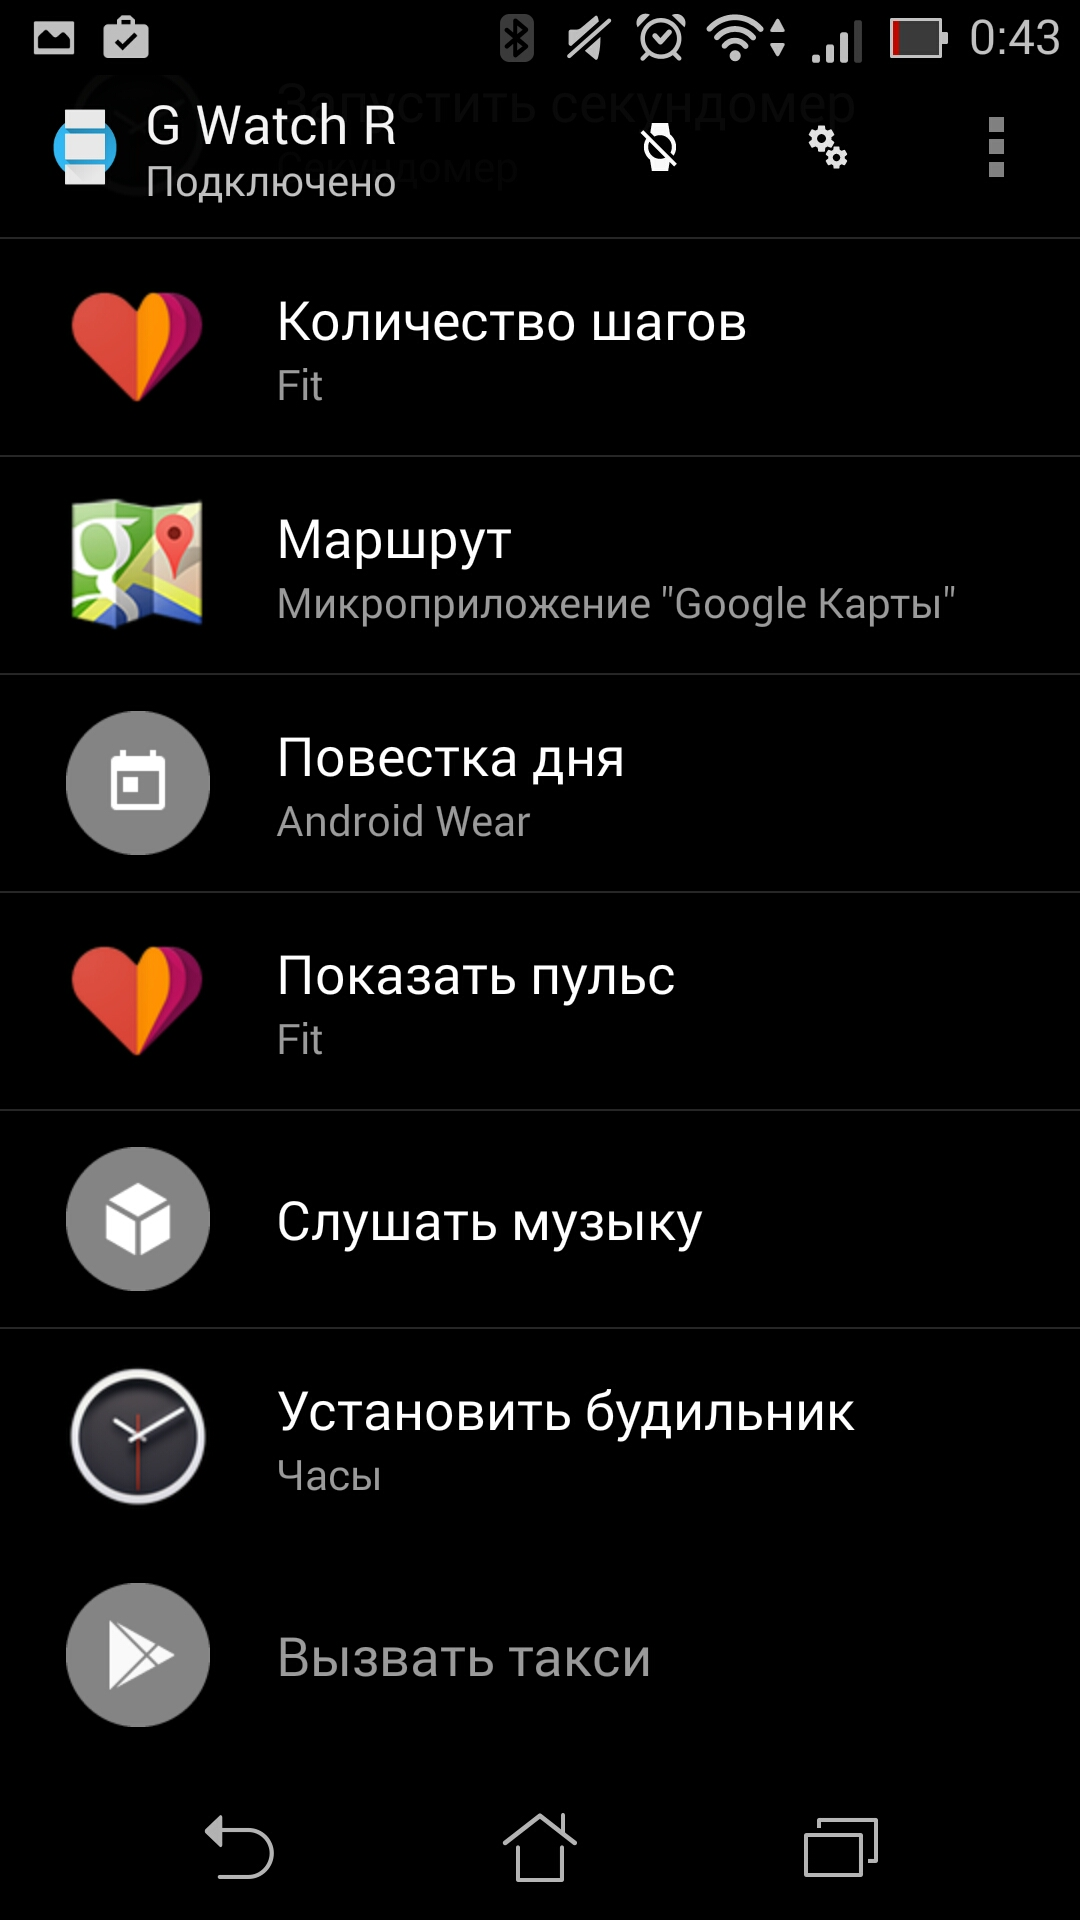 Обзор Андроид Приложений